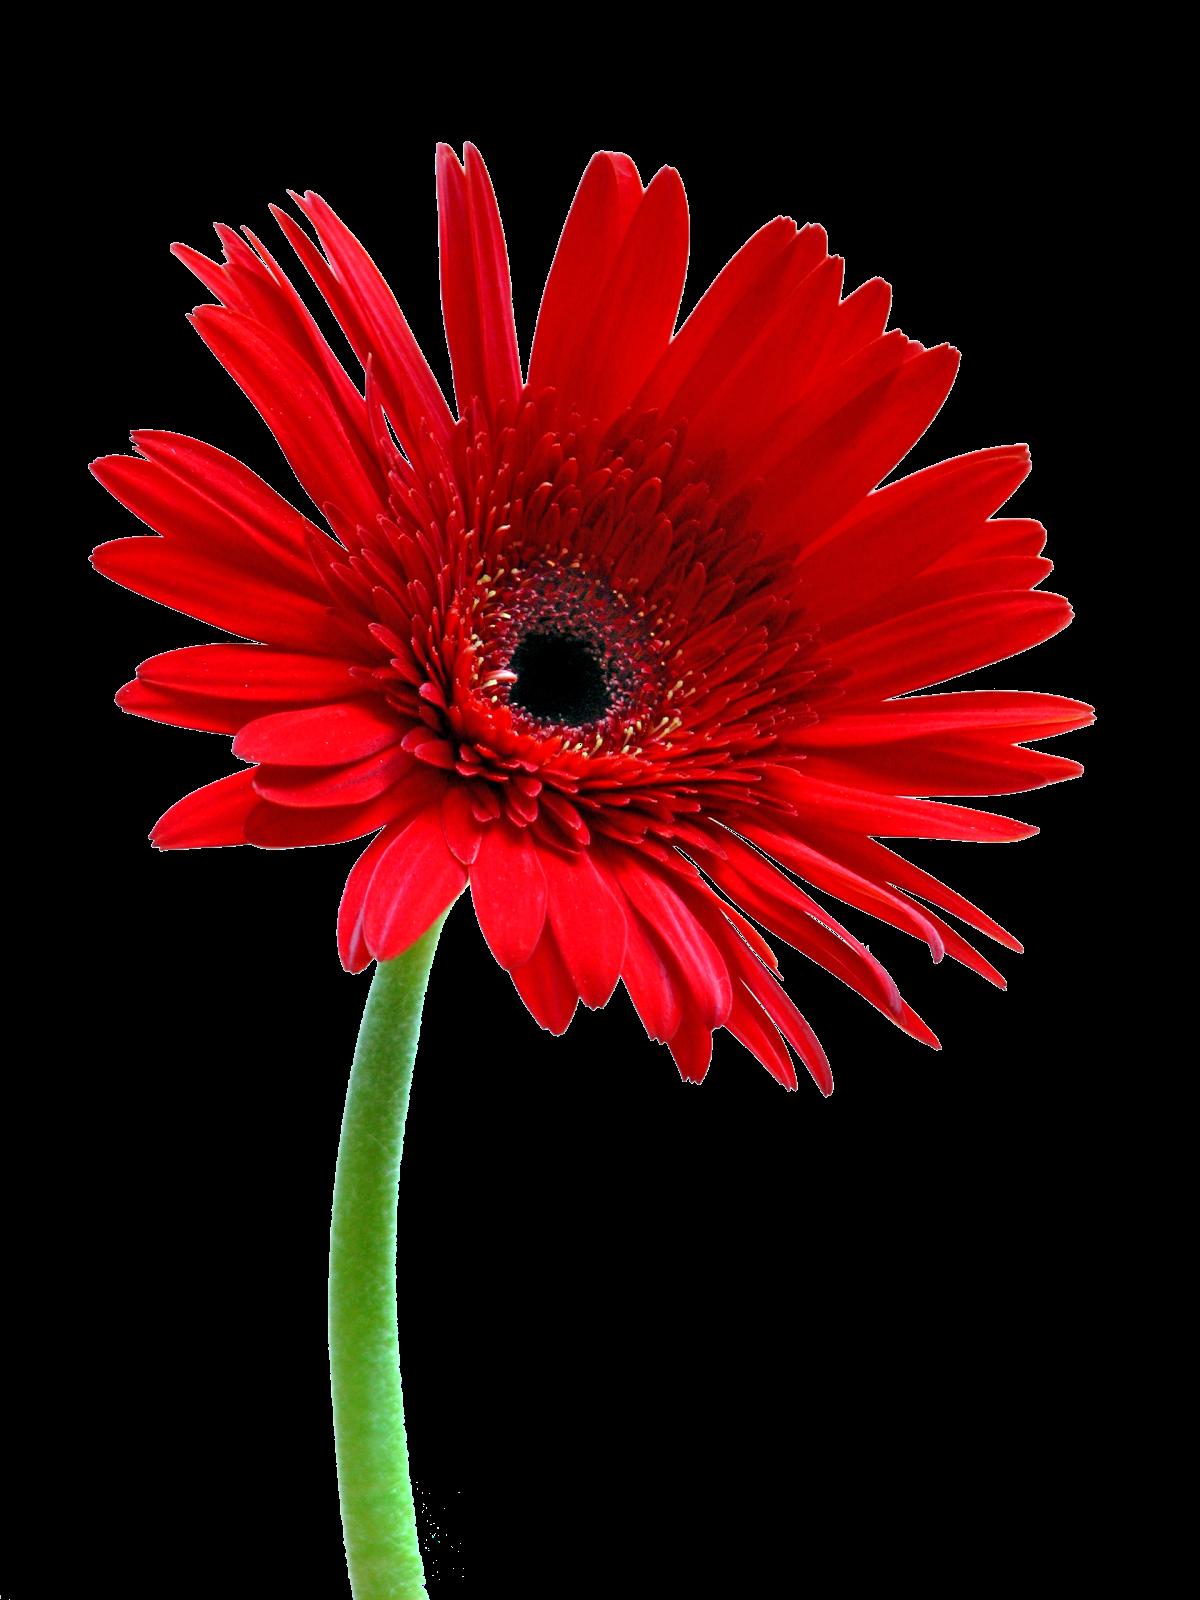 Jour de L'Extra-ordinaire.: Ma petite fleur rayonnante,